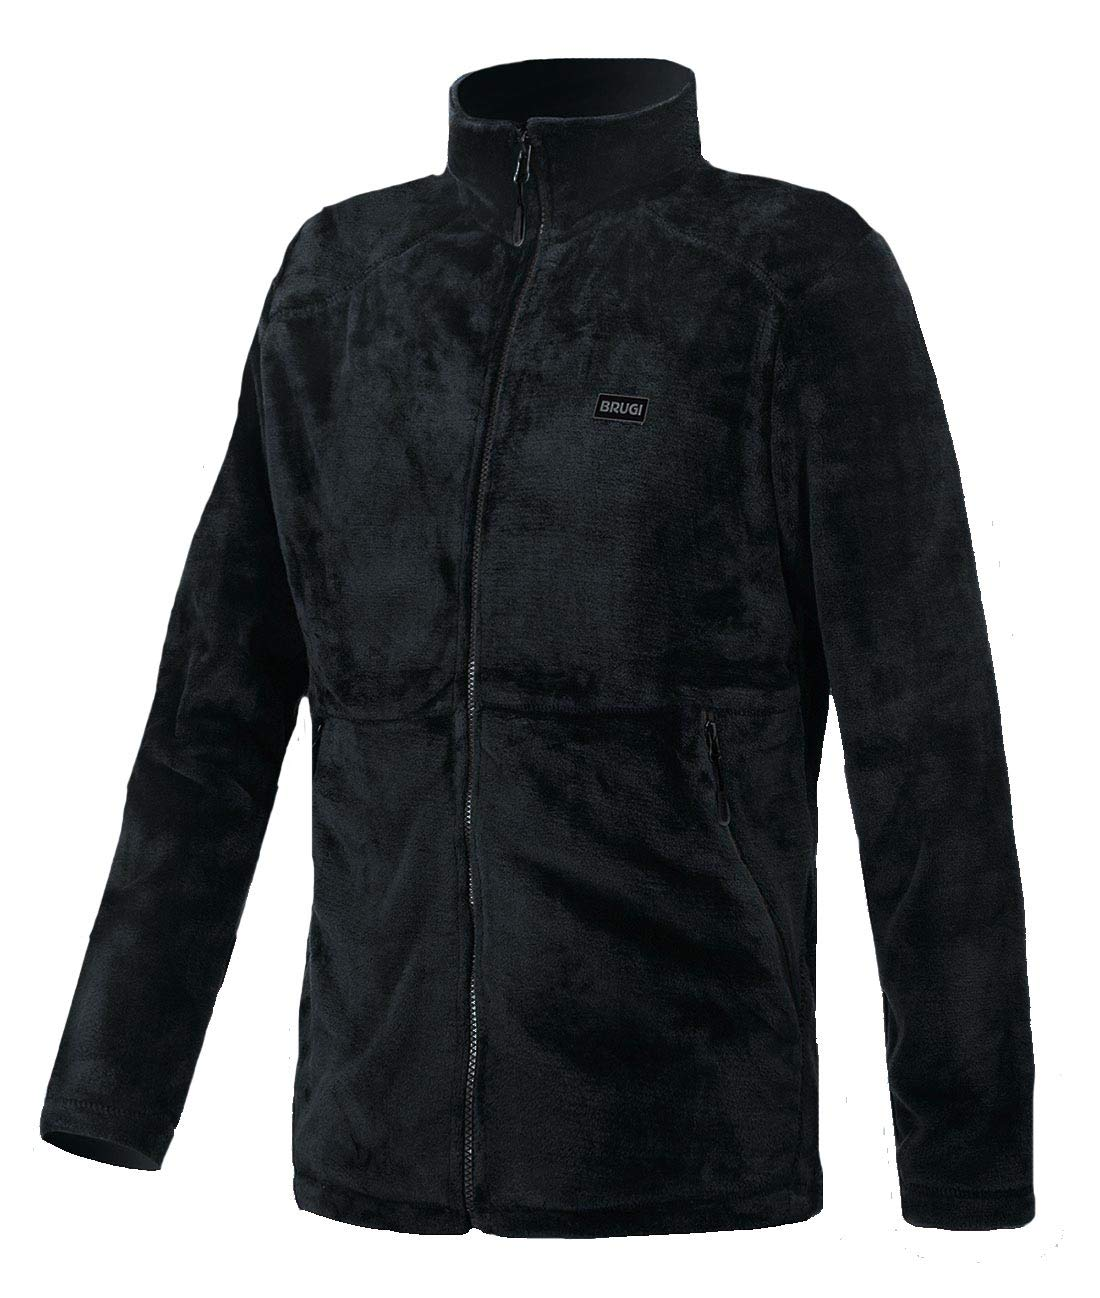 NAPAPIJRI Tabuk Pile Uomo N0YI5J041: Amazon.it: Abbigliamento